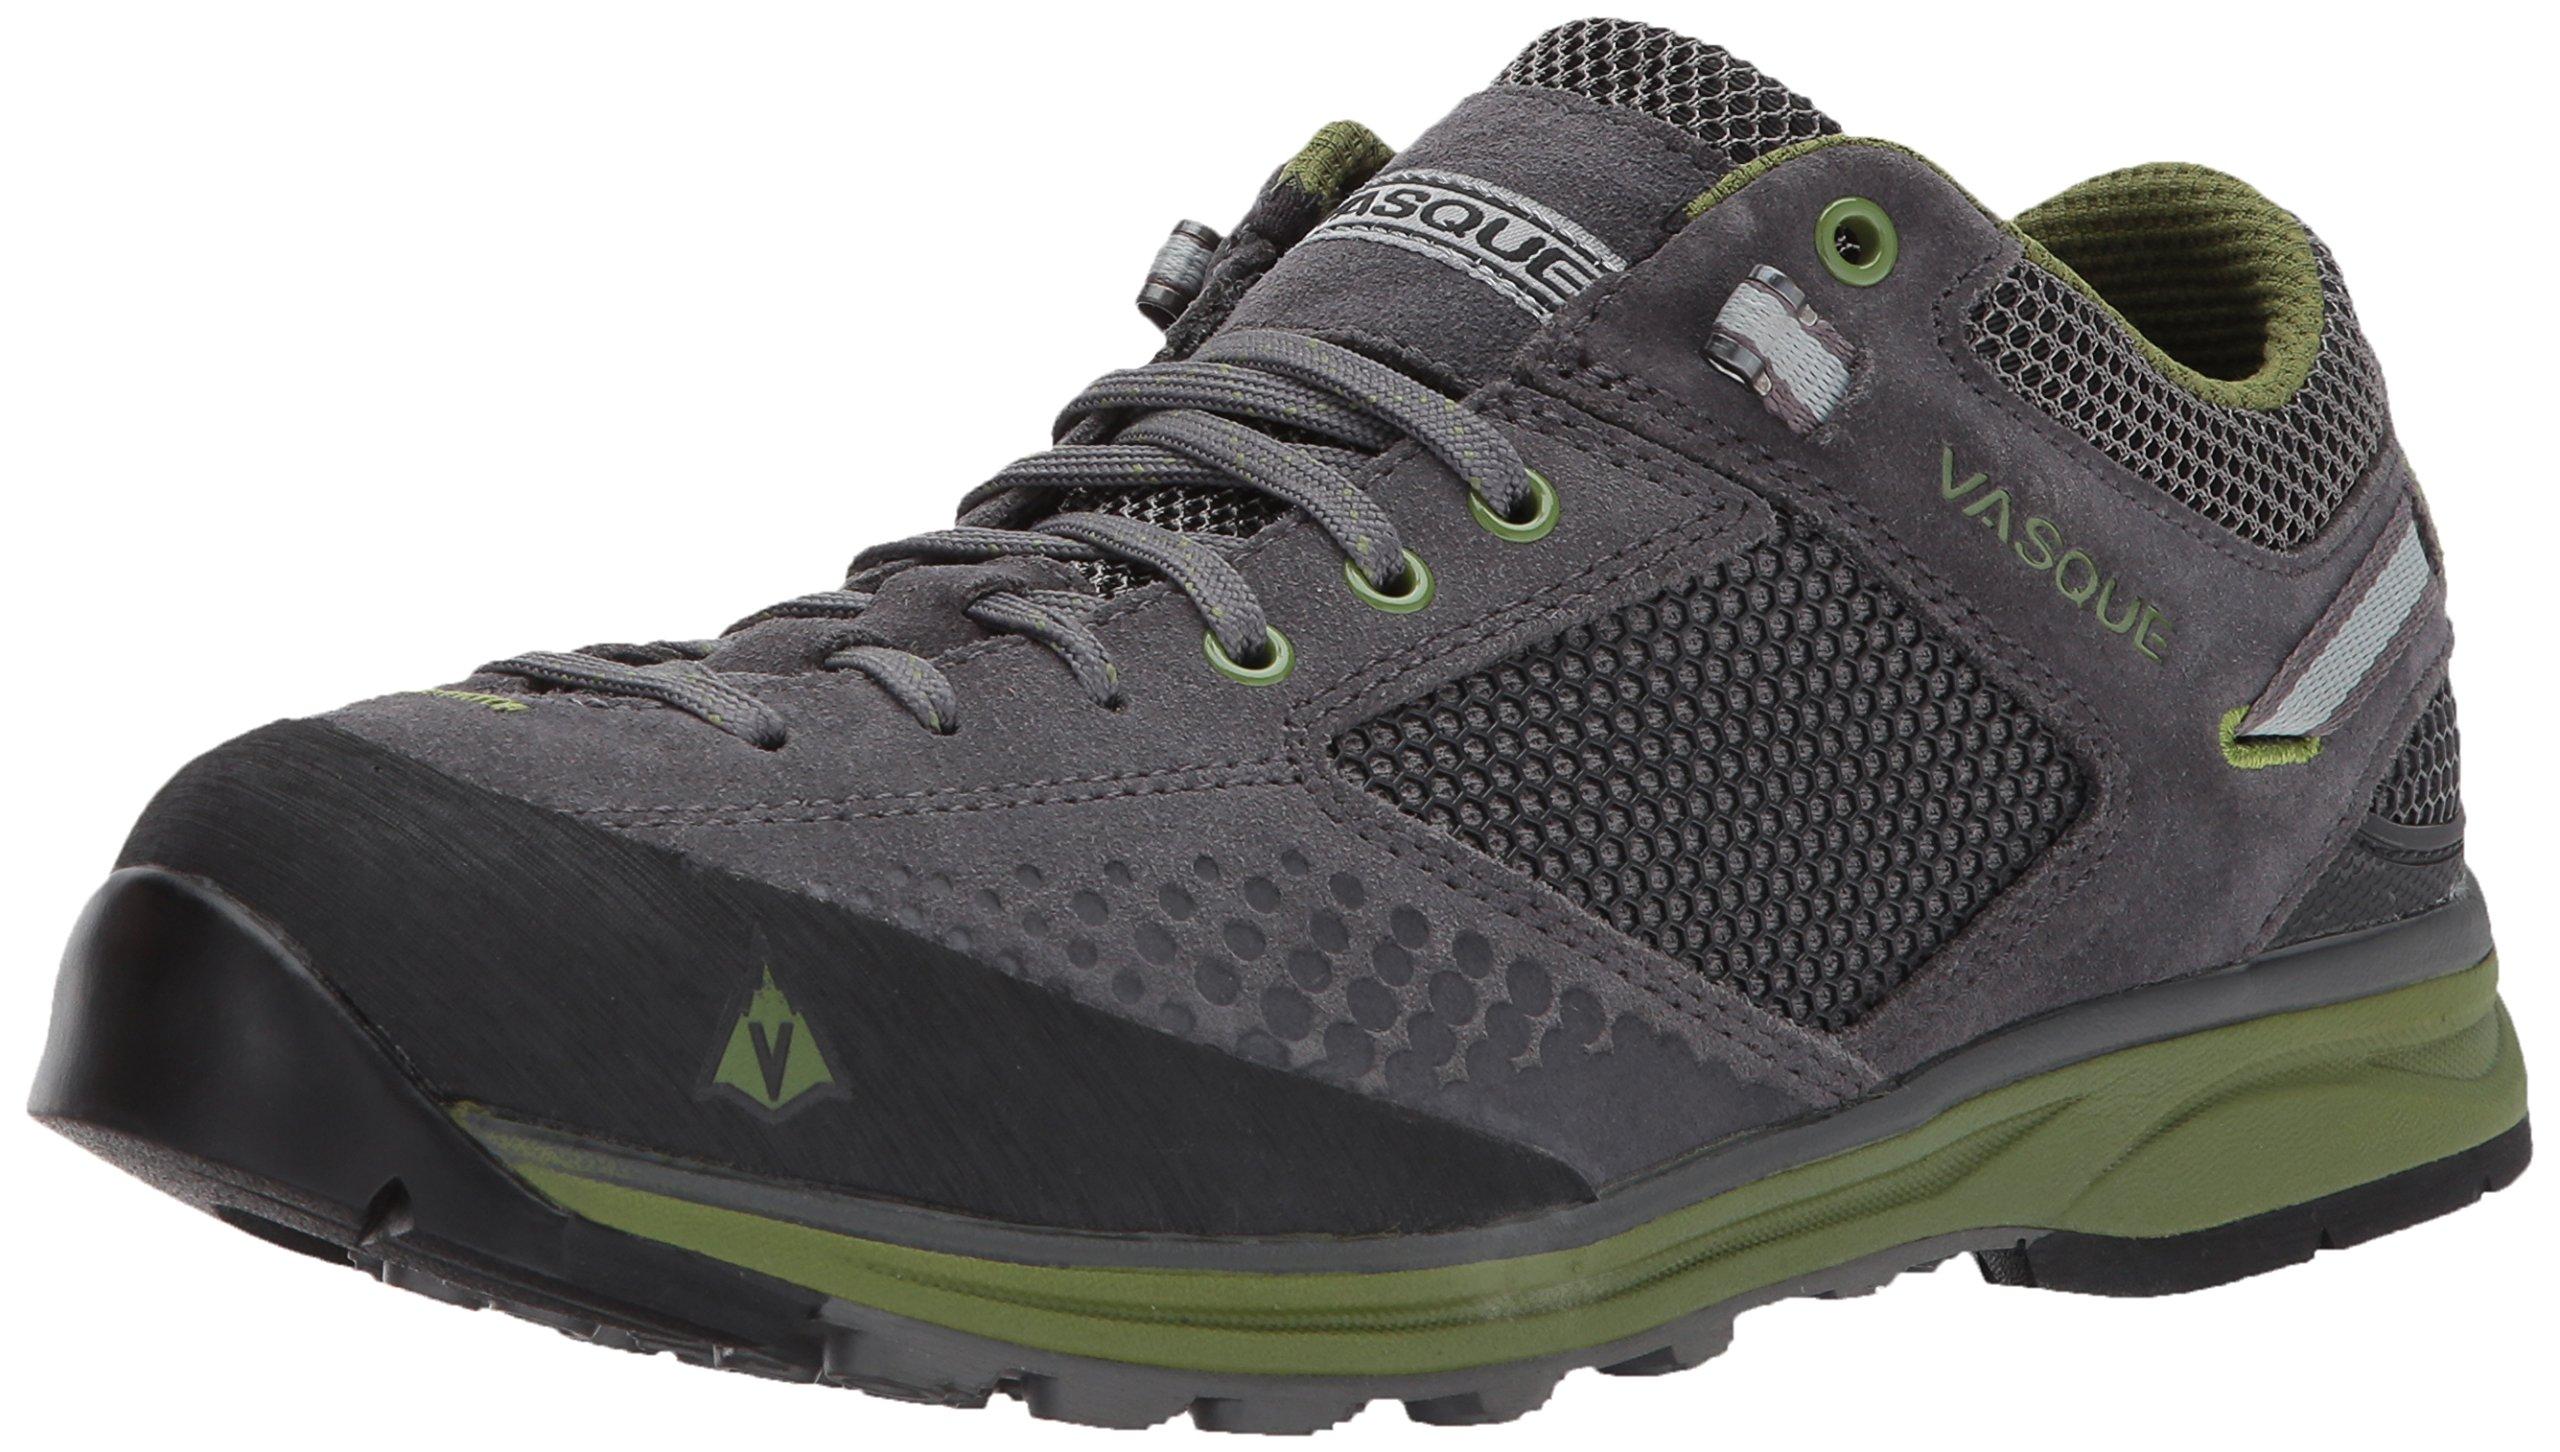 Vasque Men's Grand Traverse Hiking Shoe, Magnet/Pesto, 12 M US